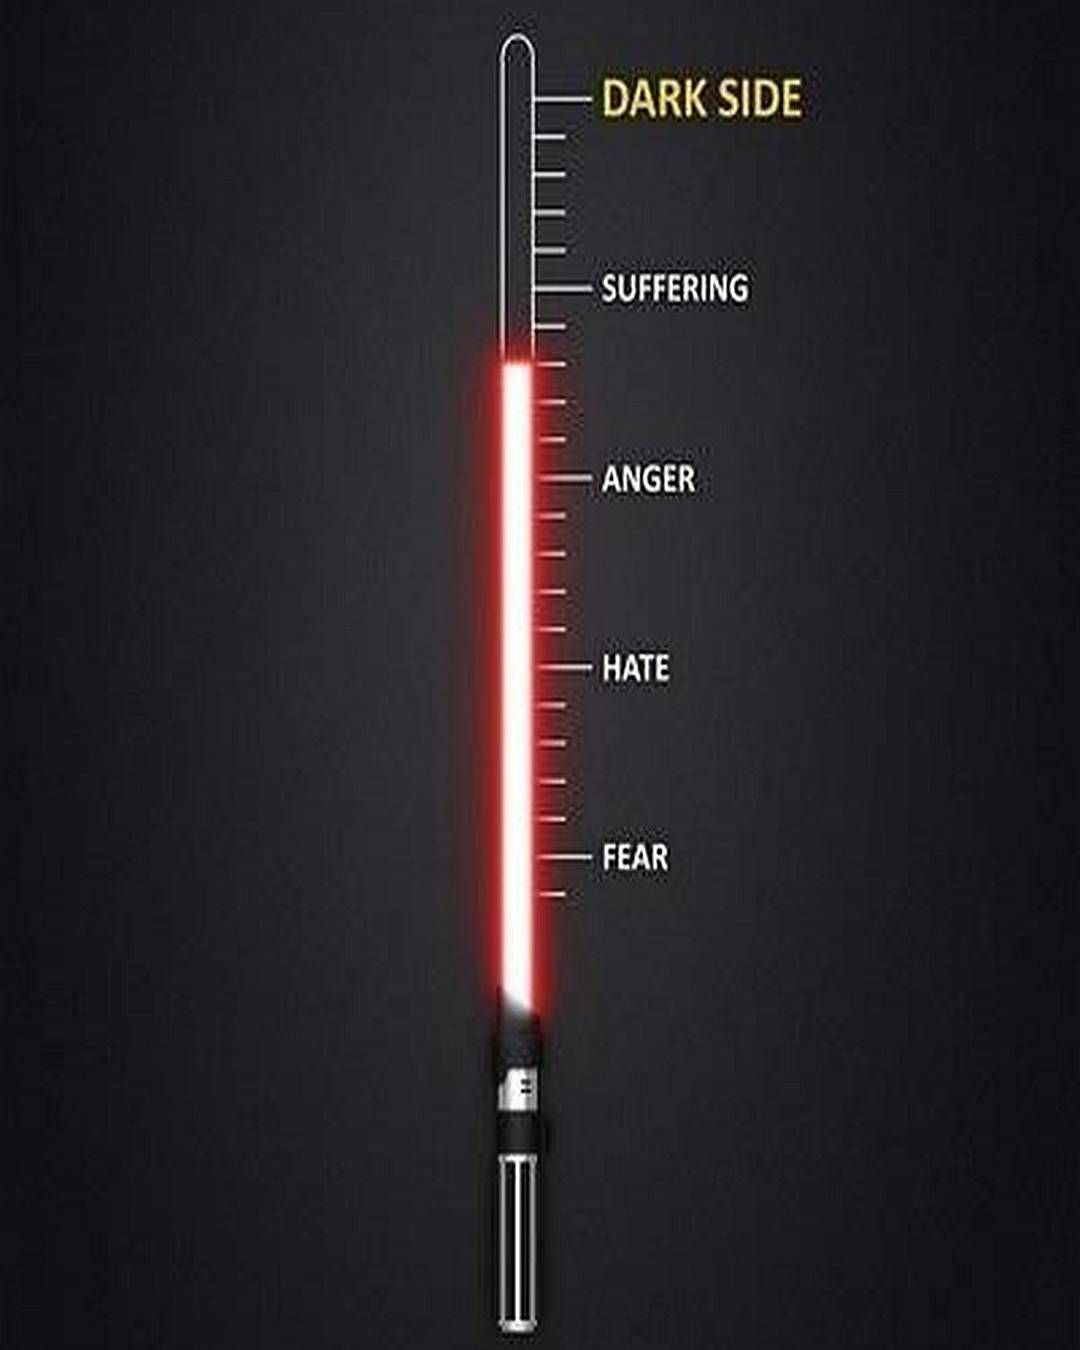 The path to the dark side #starwars #thedarkside #lightsaber